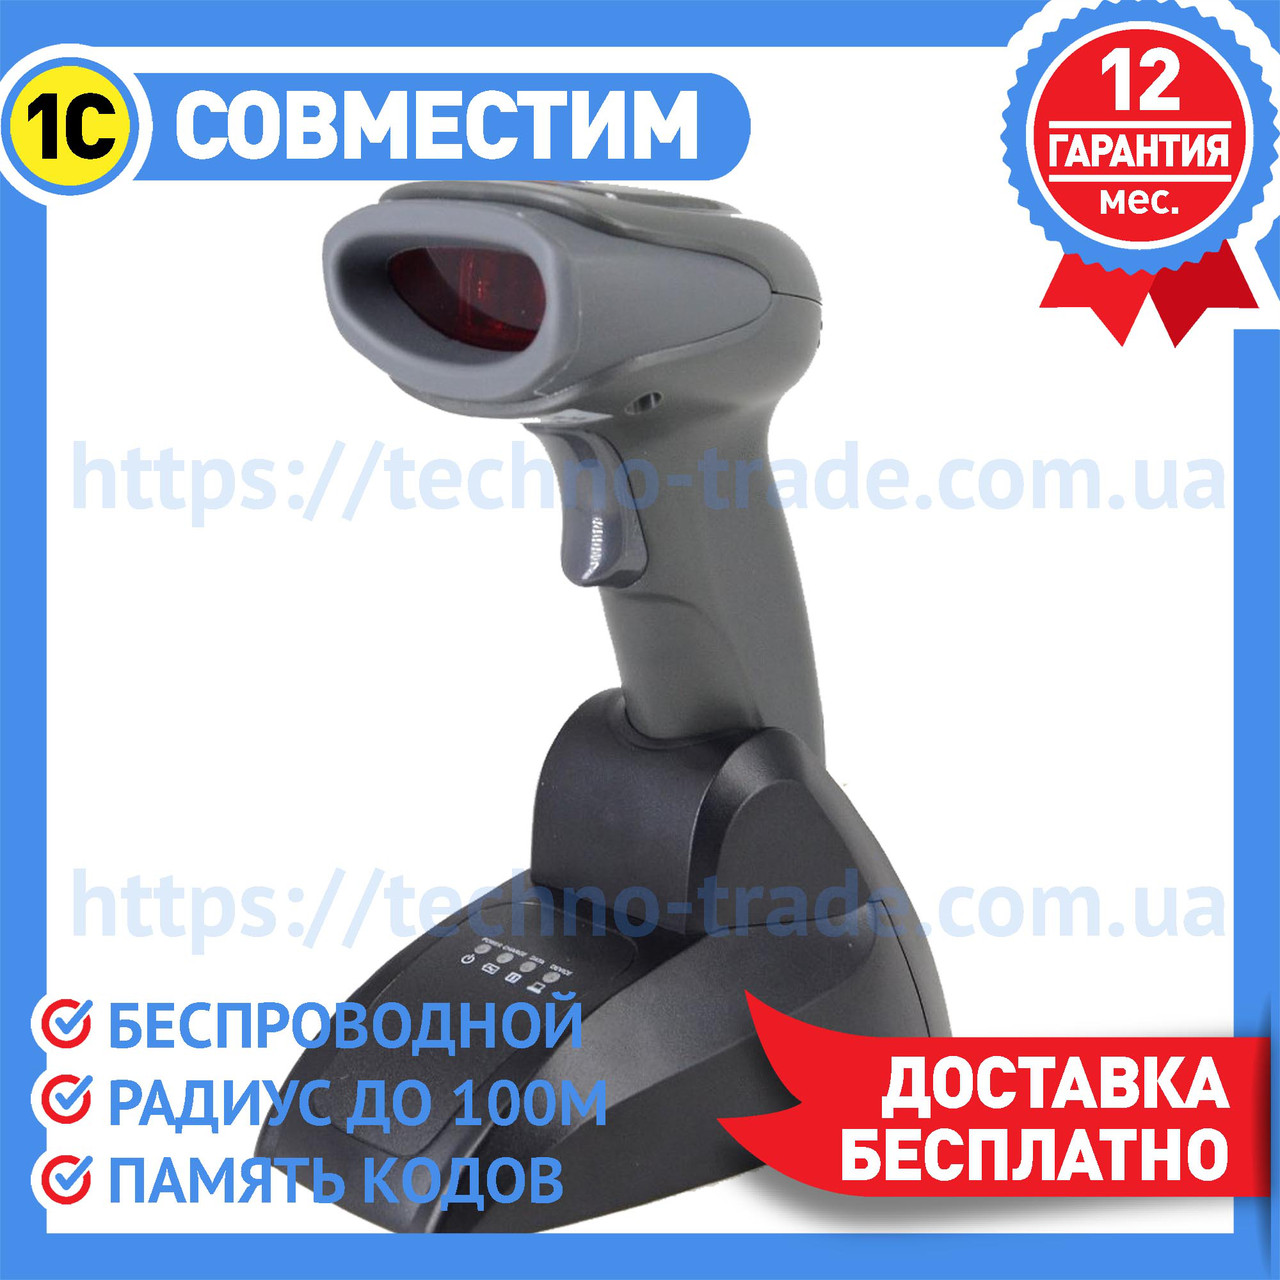 Беспроводной сканер штрих-кода Syble XB-5066RT